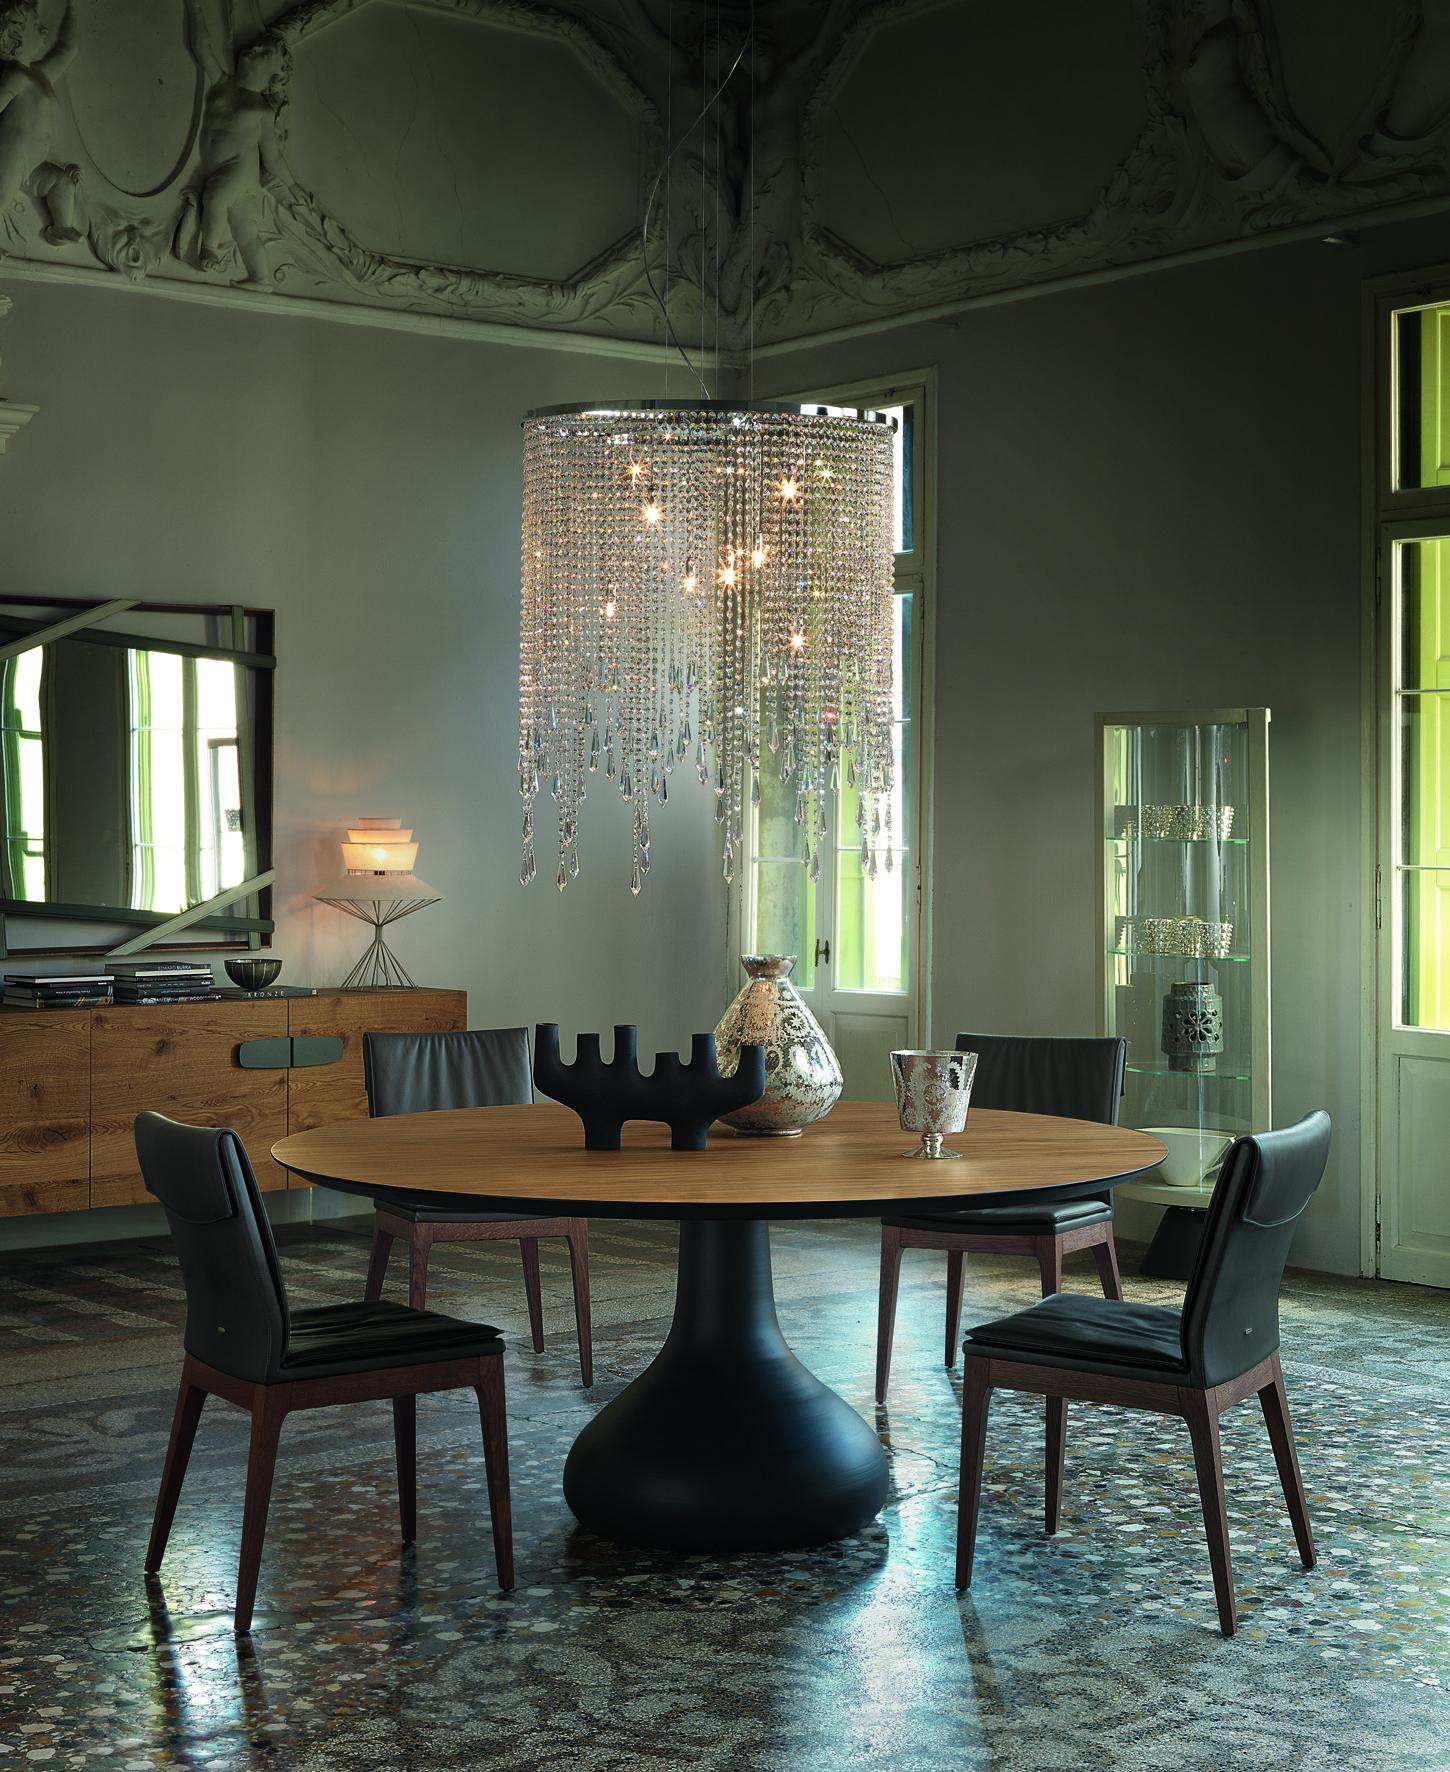 Tosca Chair By Cattelan Italia Cattelan Italia Furniture  # Muebles Di Giano